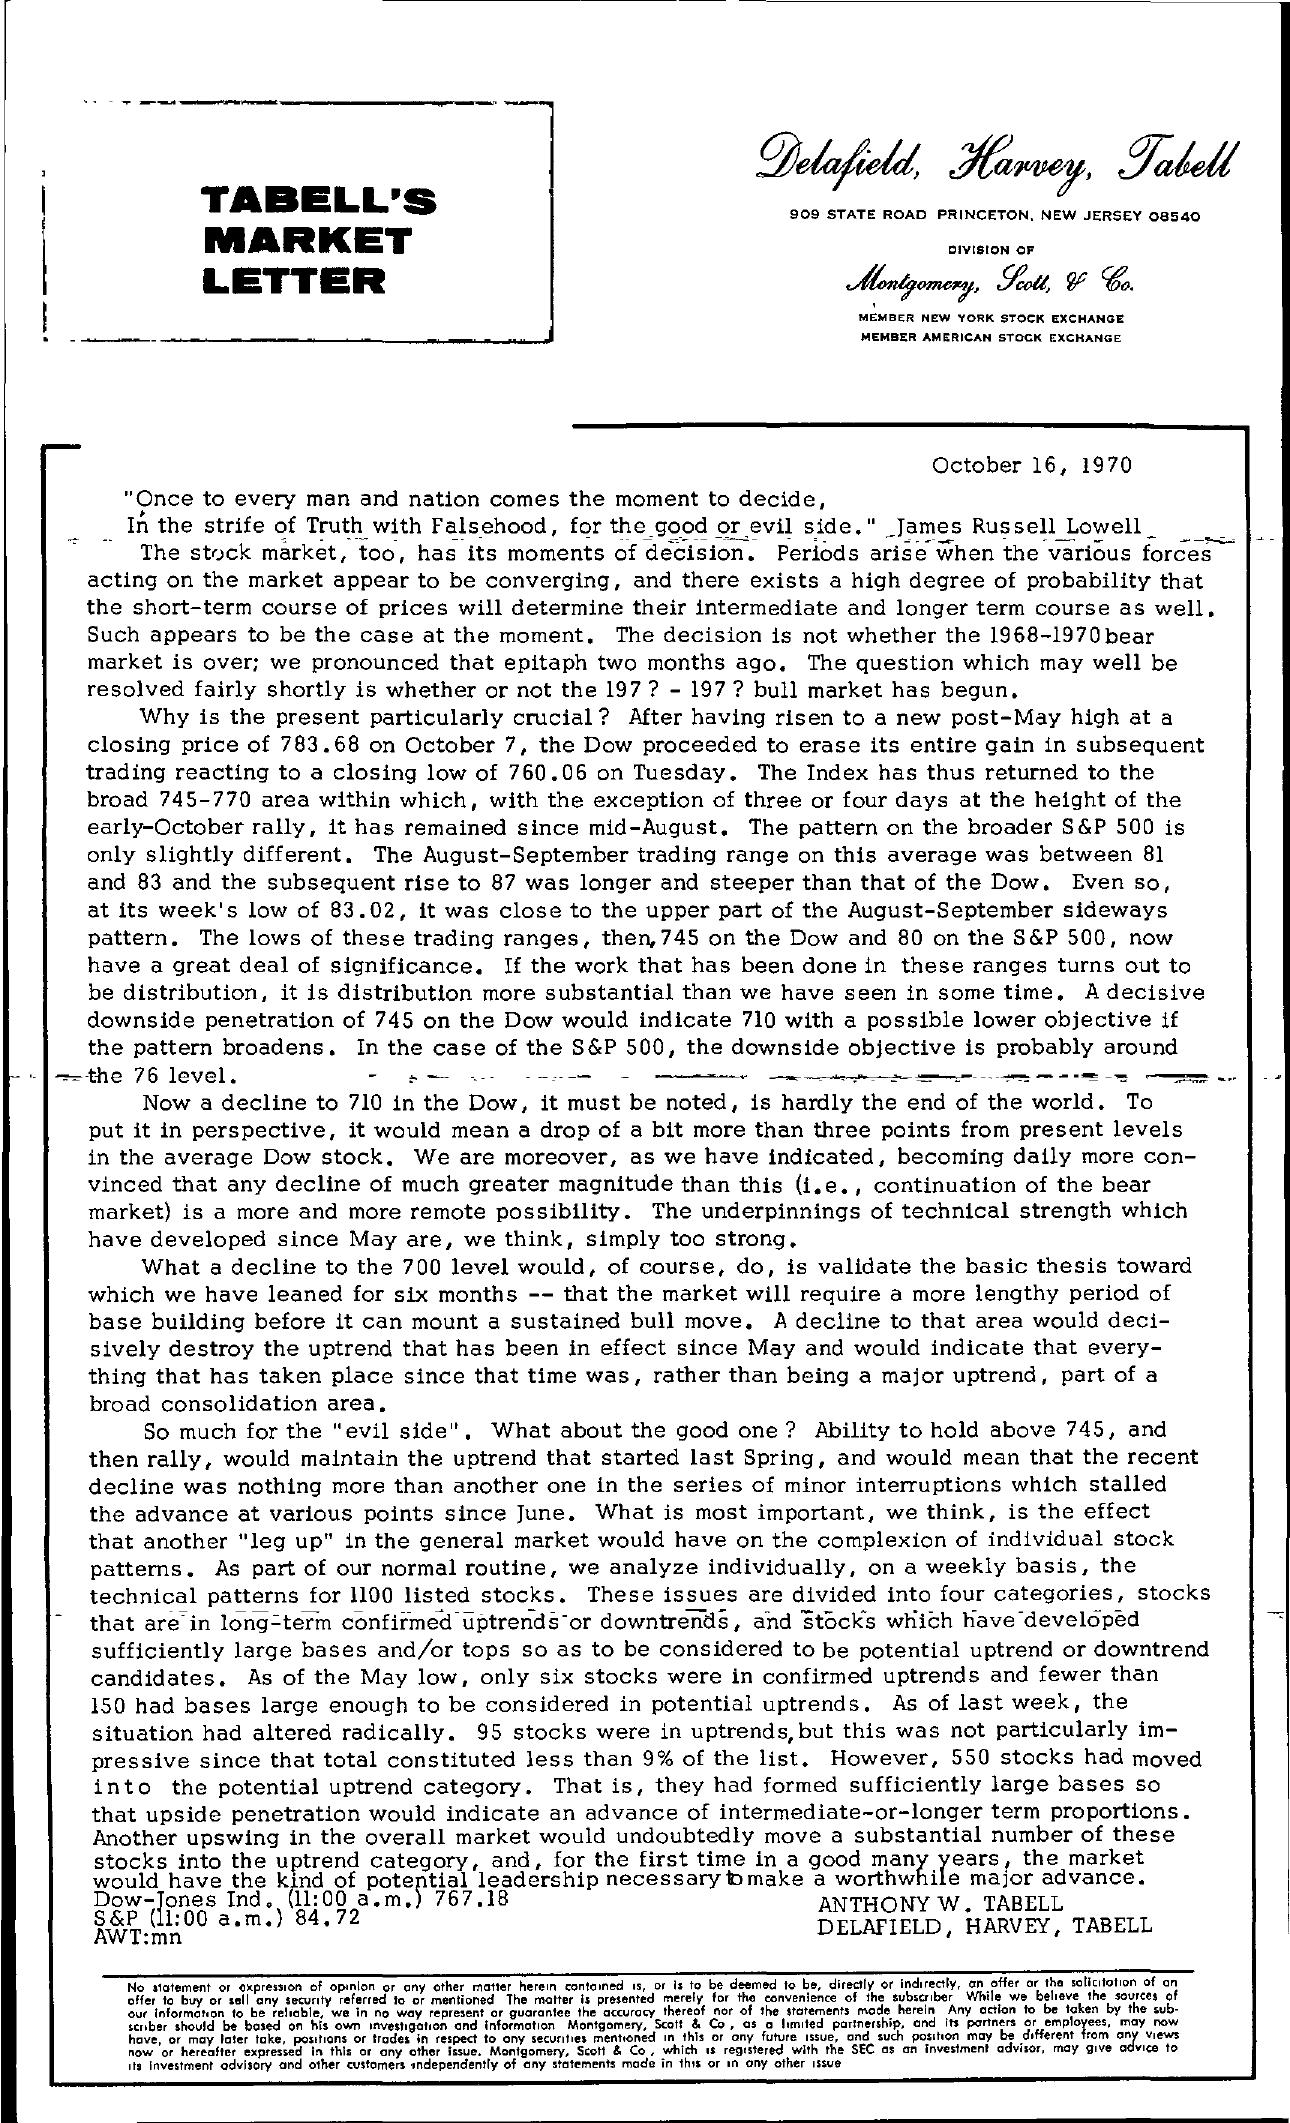 Tabell's Market Letter - October 16, 1970